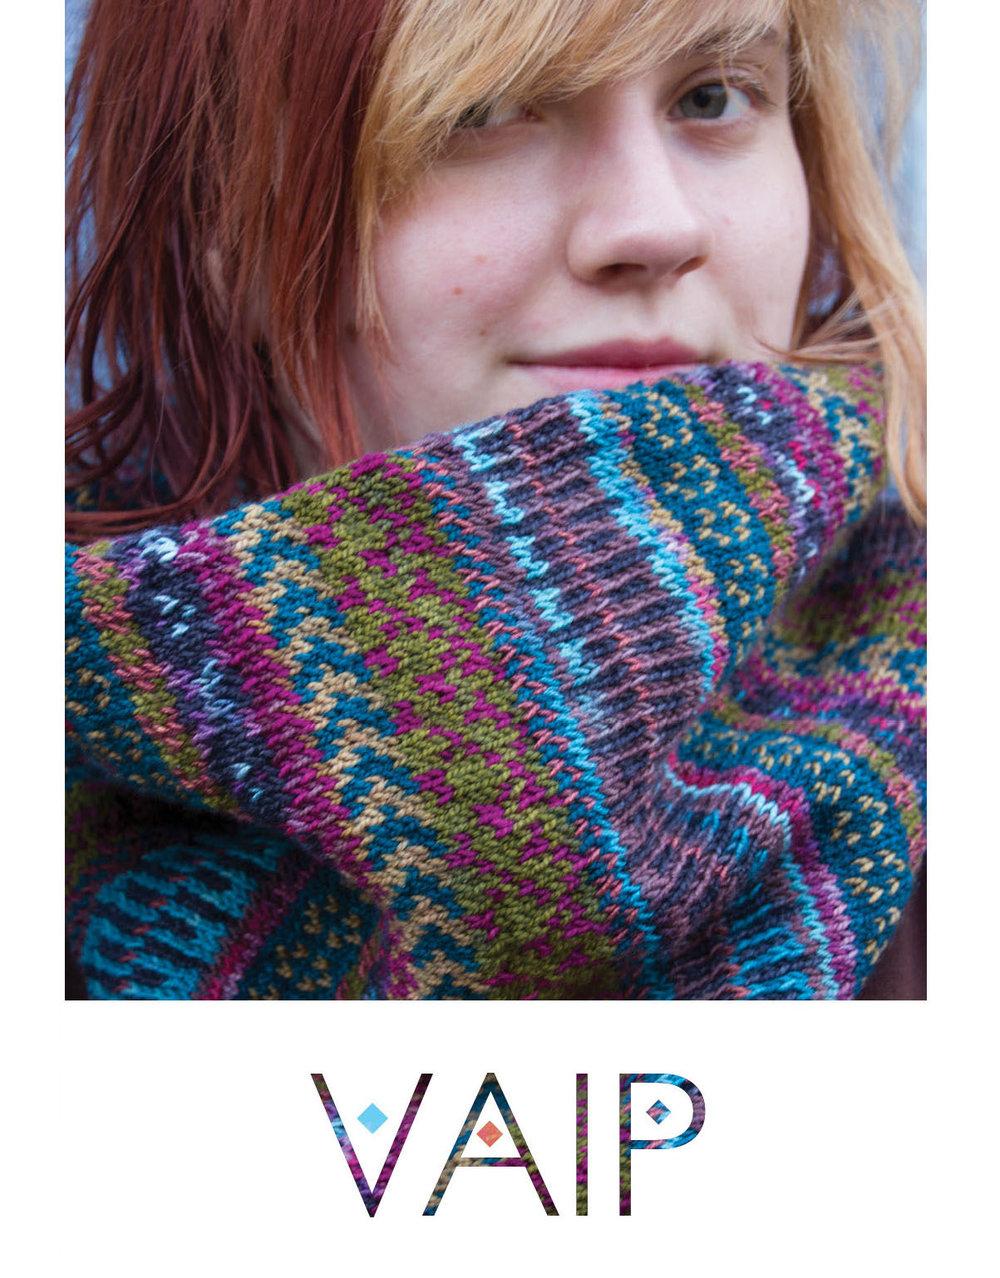 Vaip cowl knitting pattern